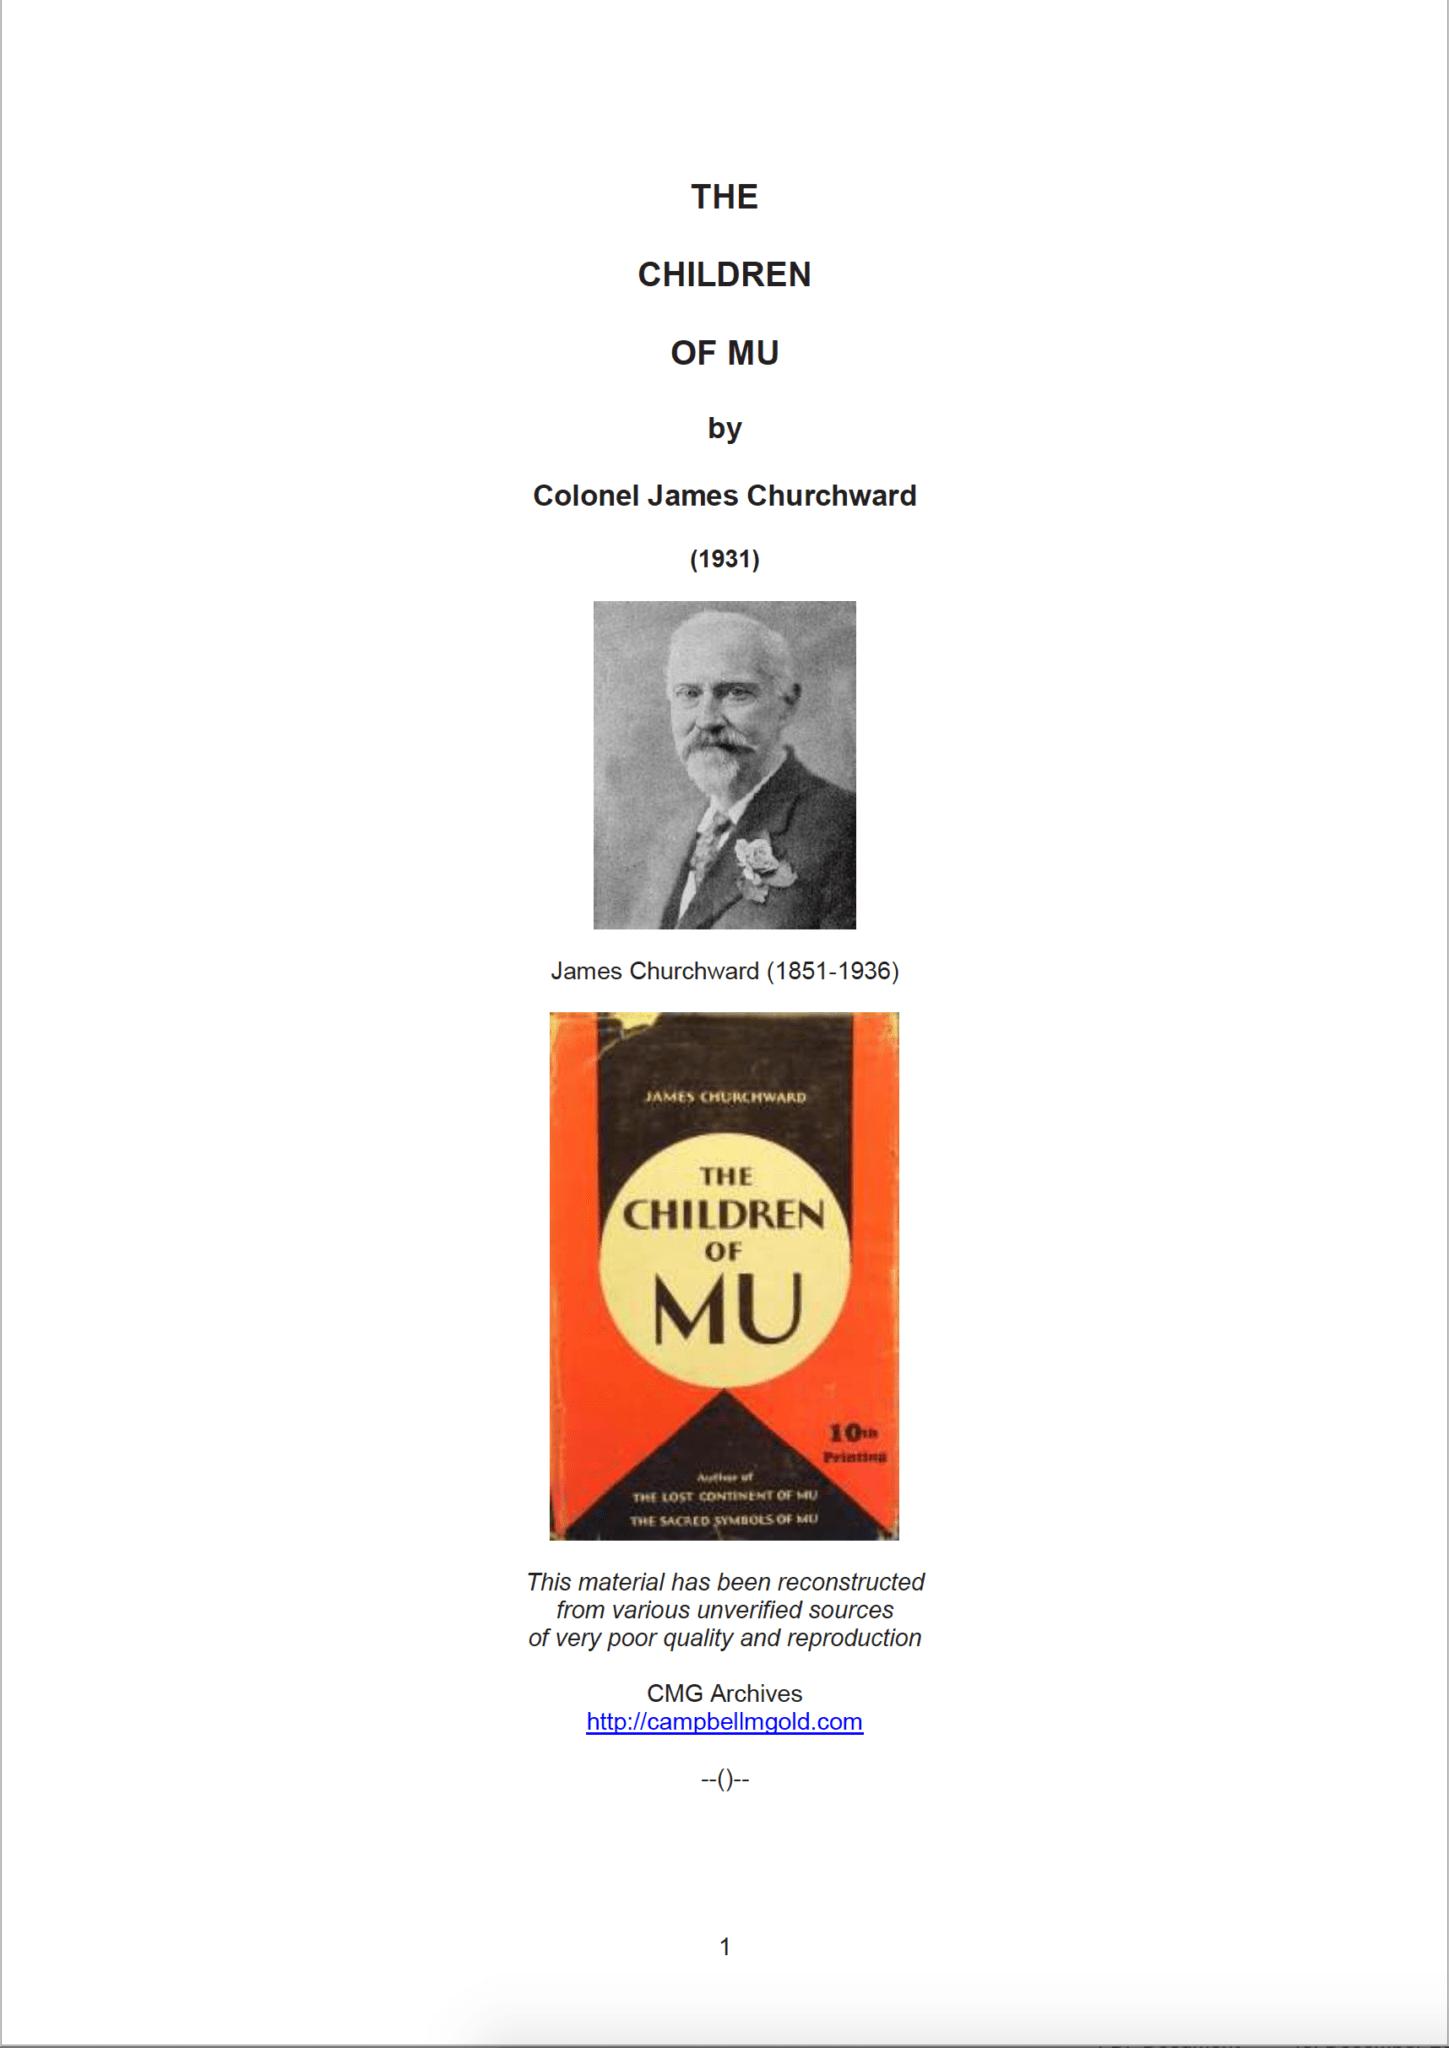 Screenshot 2020 02 09 at 15.26.08 - The Children of Mu -  James Churchward